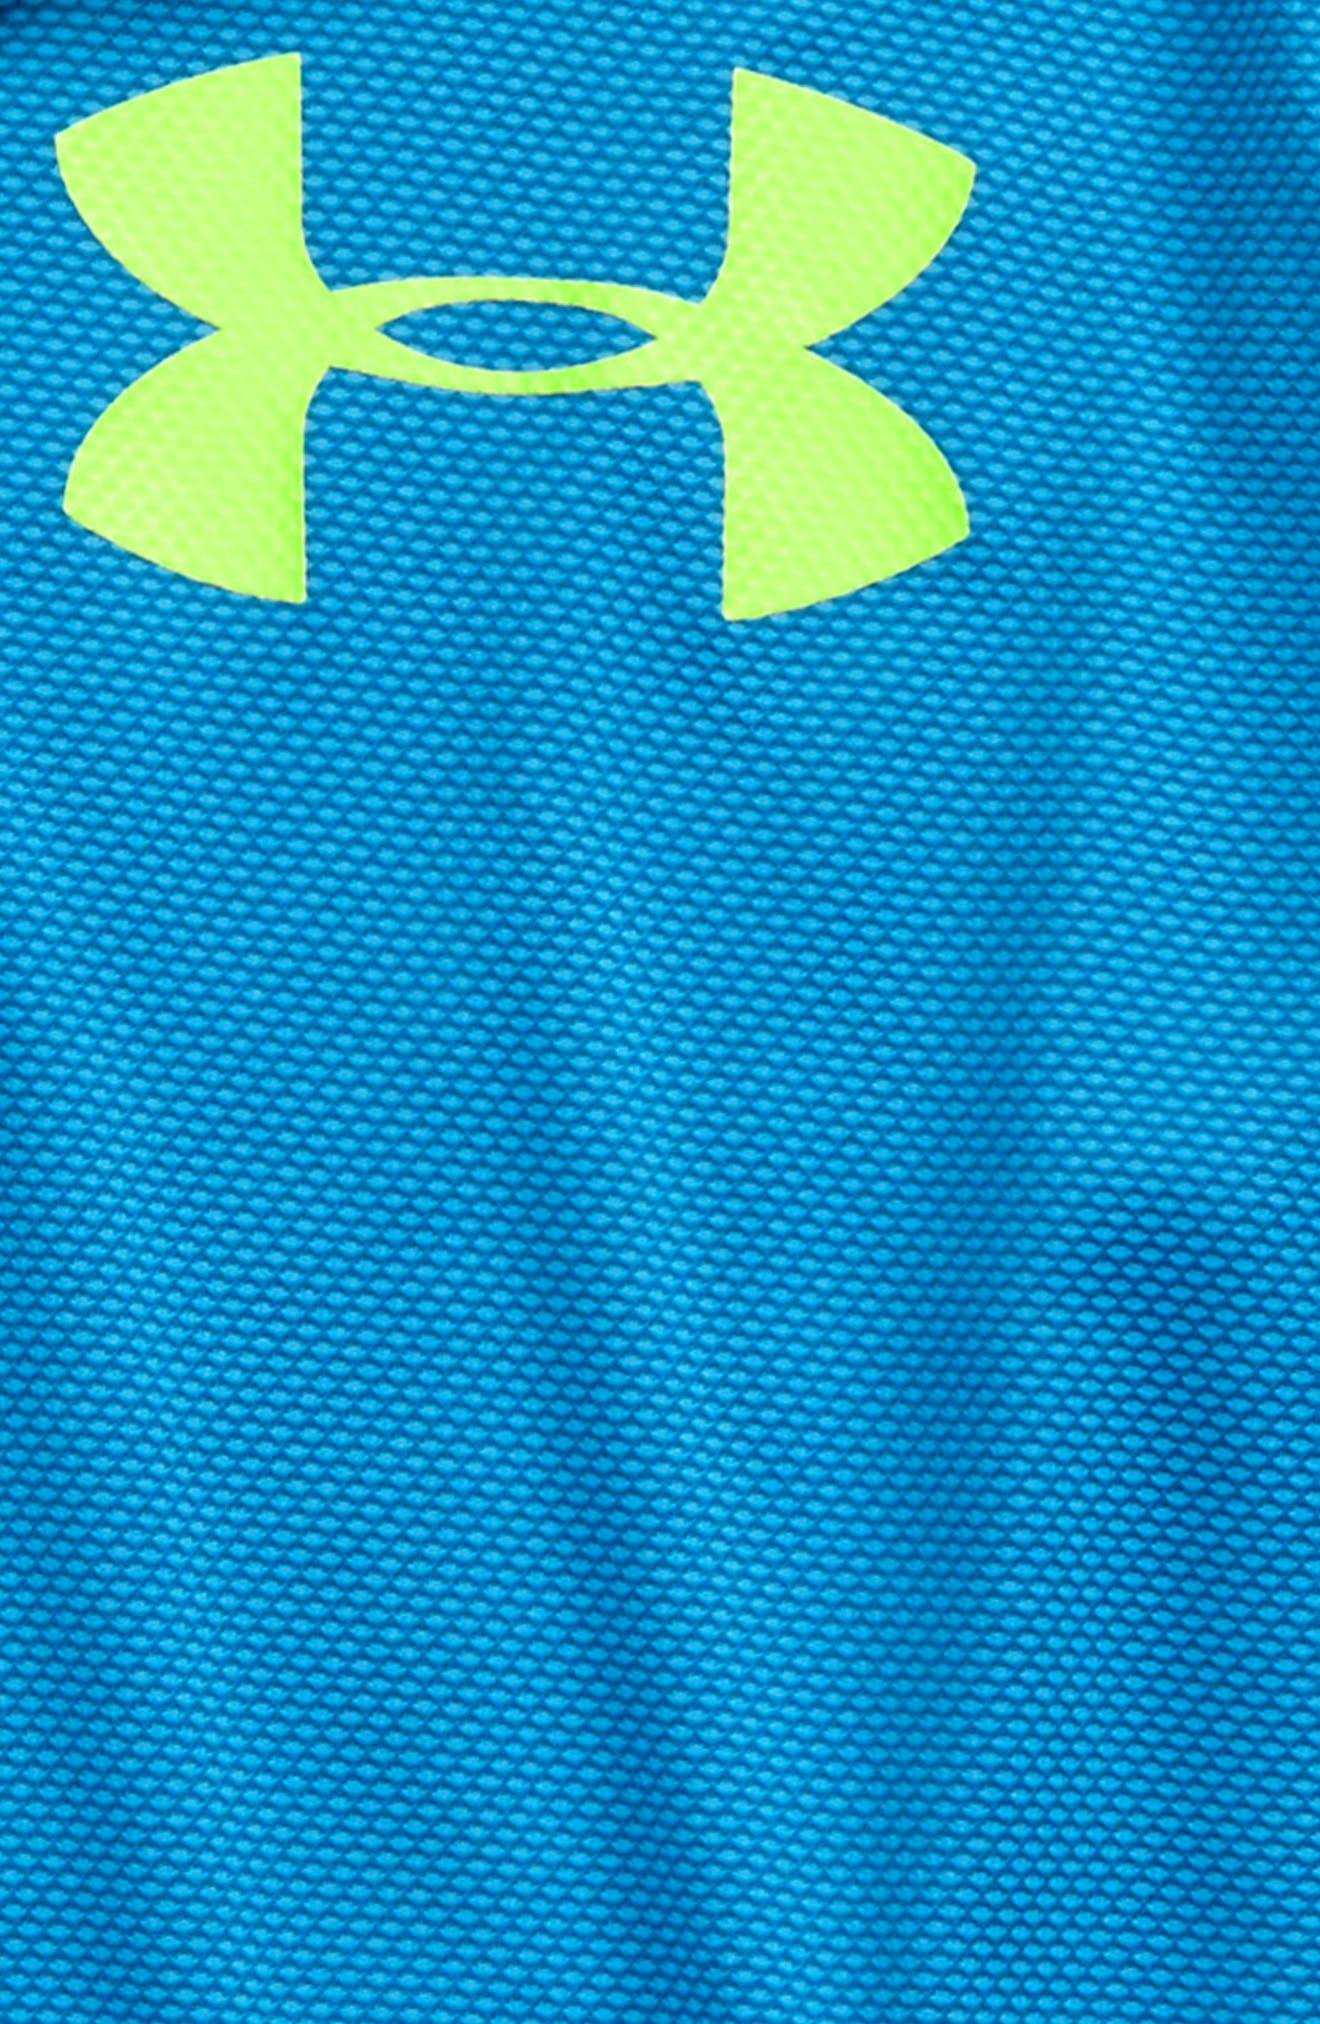 Alternate Image 2  - Under Armour Textured Quarter Zip Top (Little Boys & Big Boys)